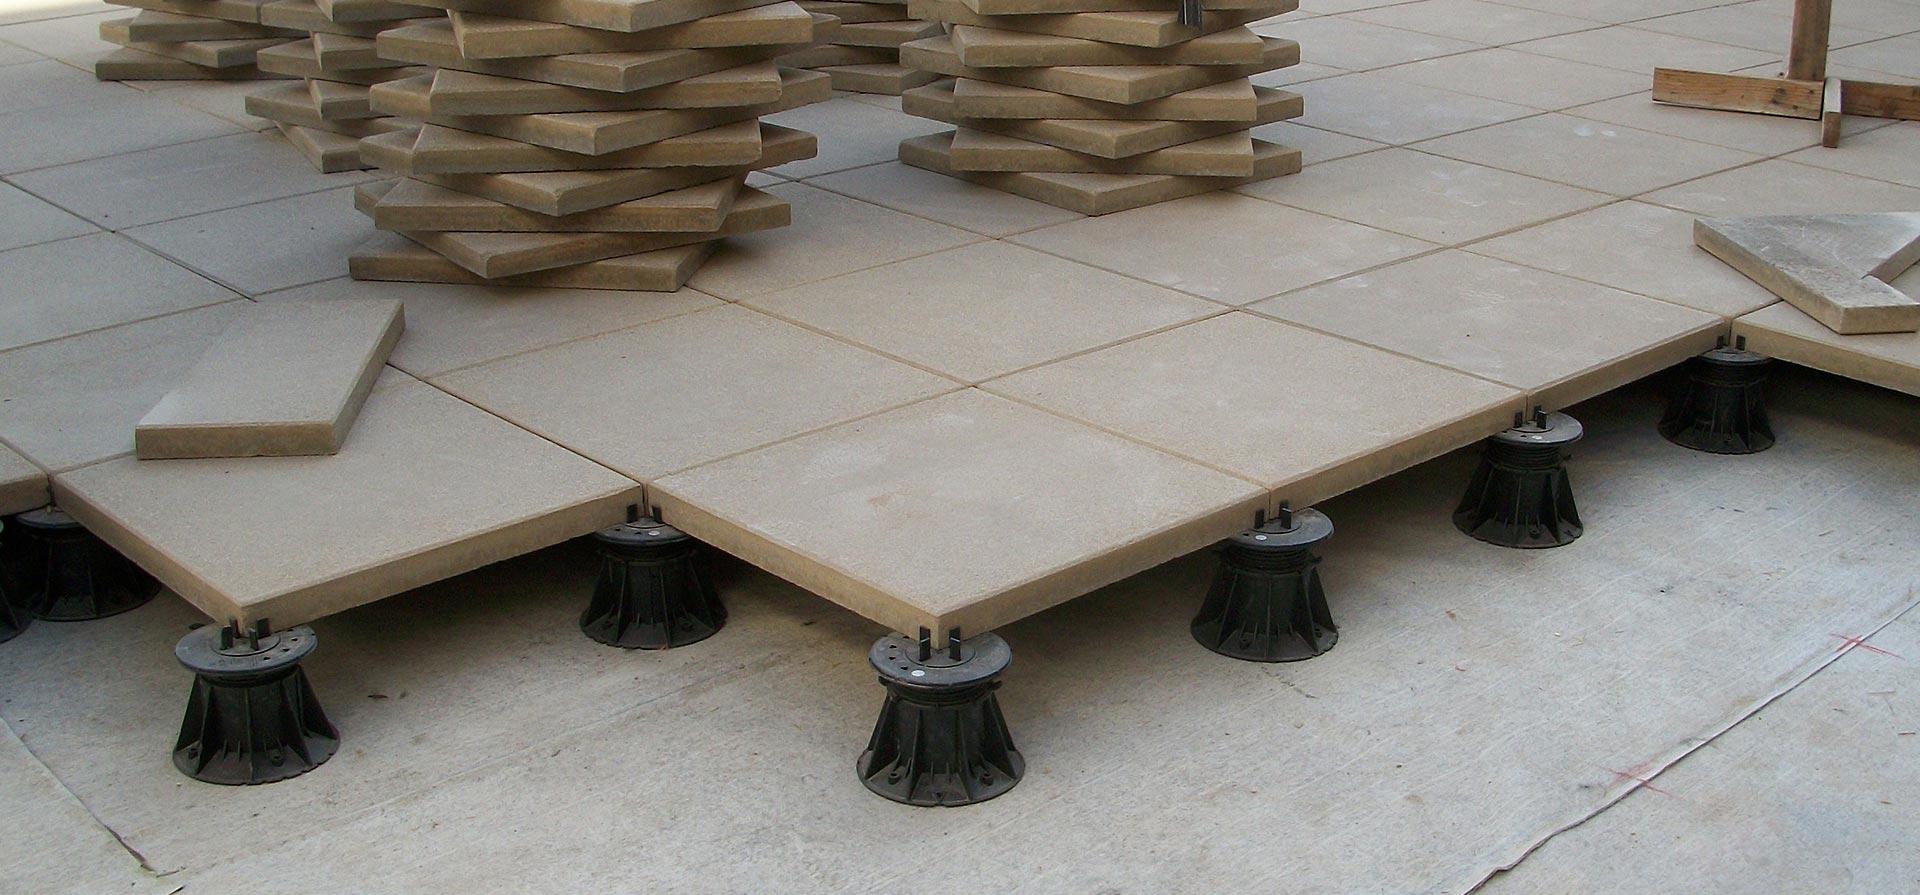 Versijack Deck Paver Pedestal System Tournesol Siteworks Llc within sizing 1920 X 895